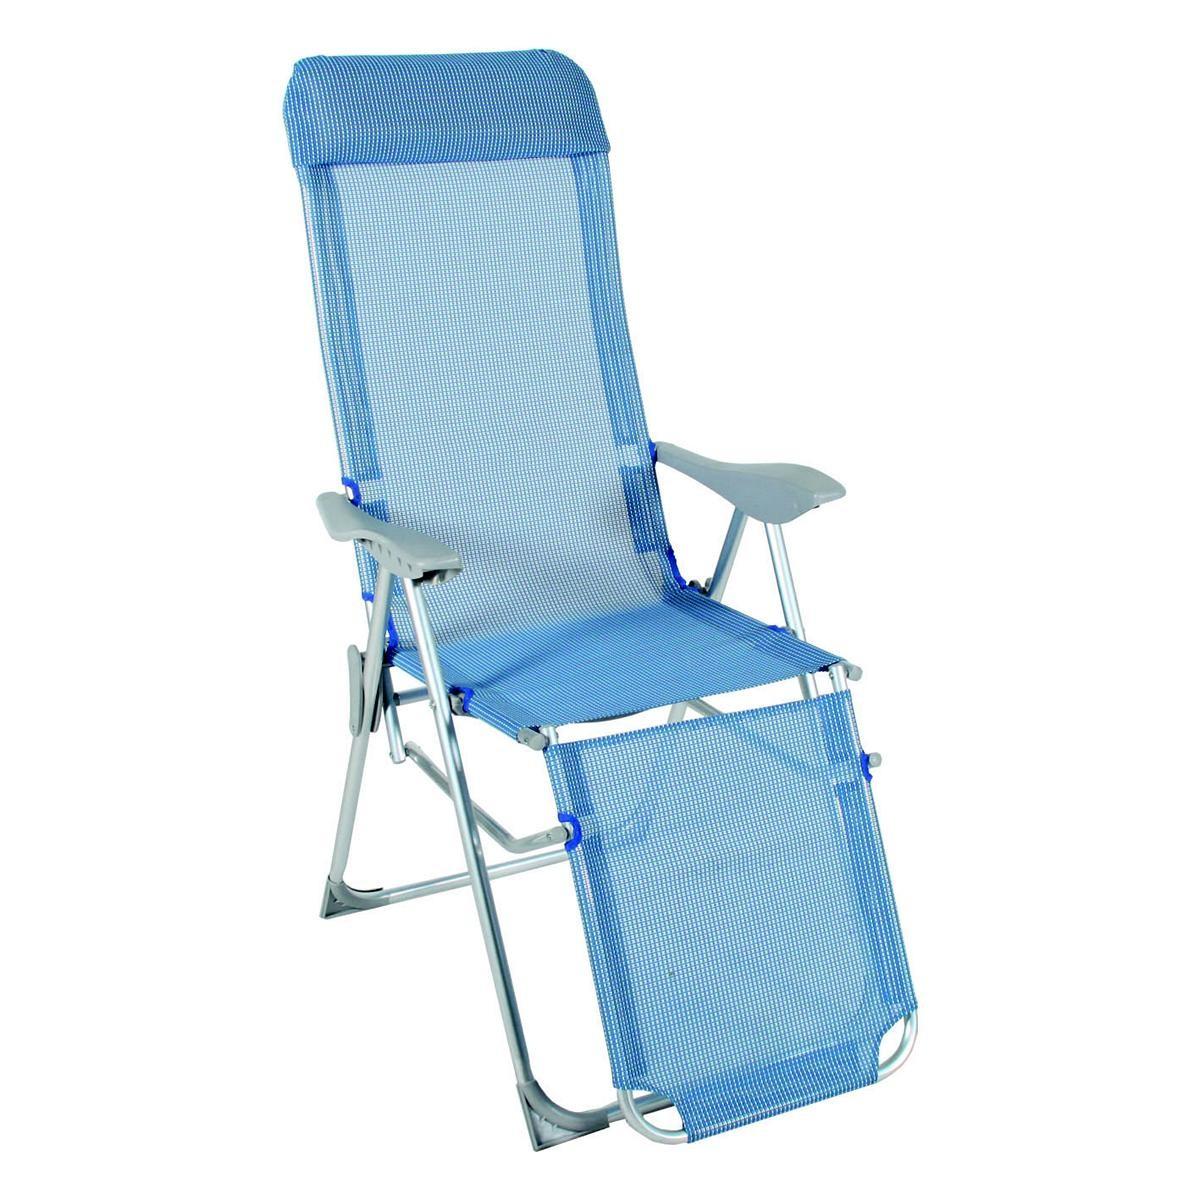 Relaxsessel blau wei relax liegestuhl klappbar klappsessel camping stuhl liege - Liegestuhl camping ...